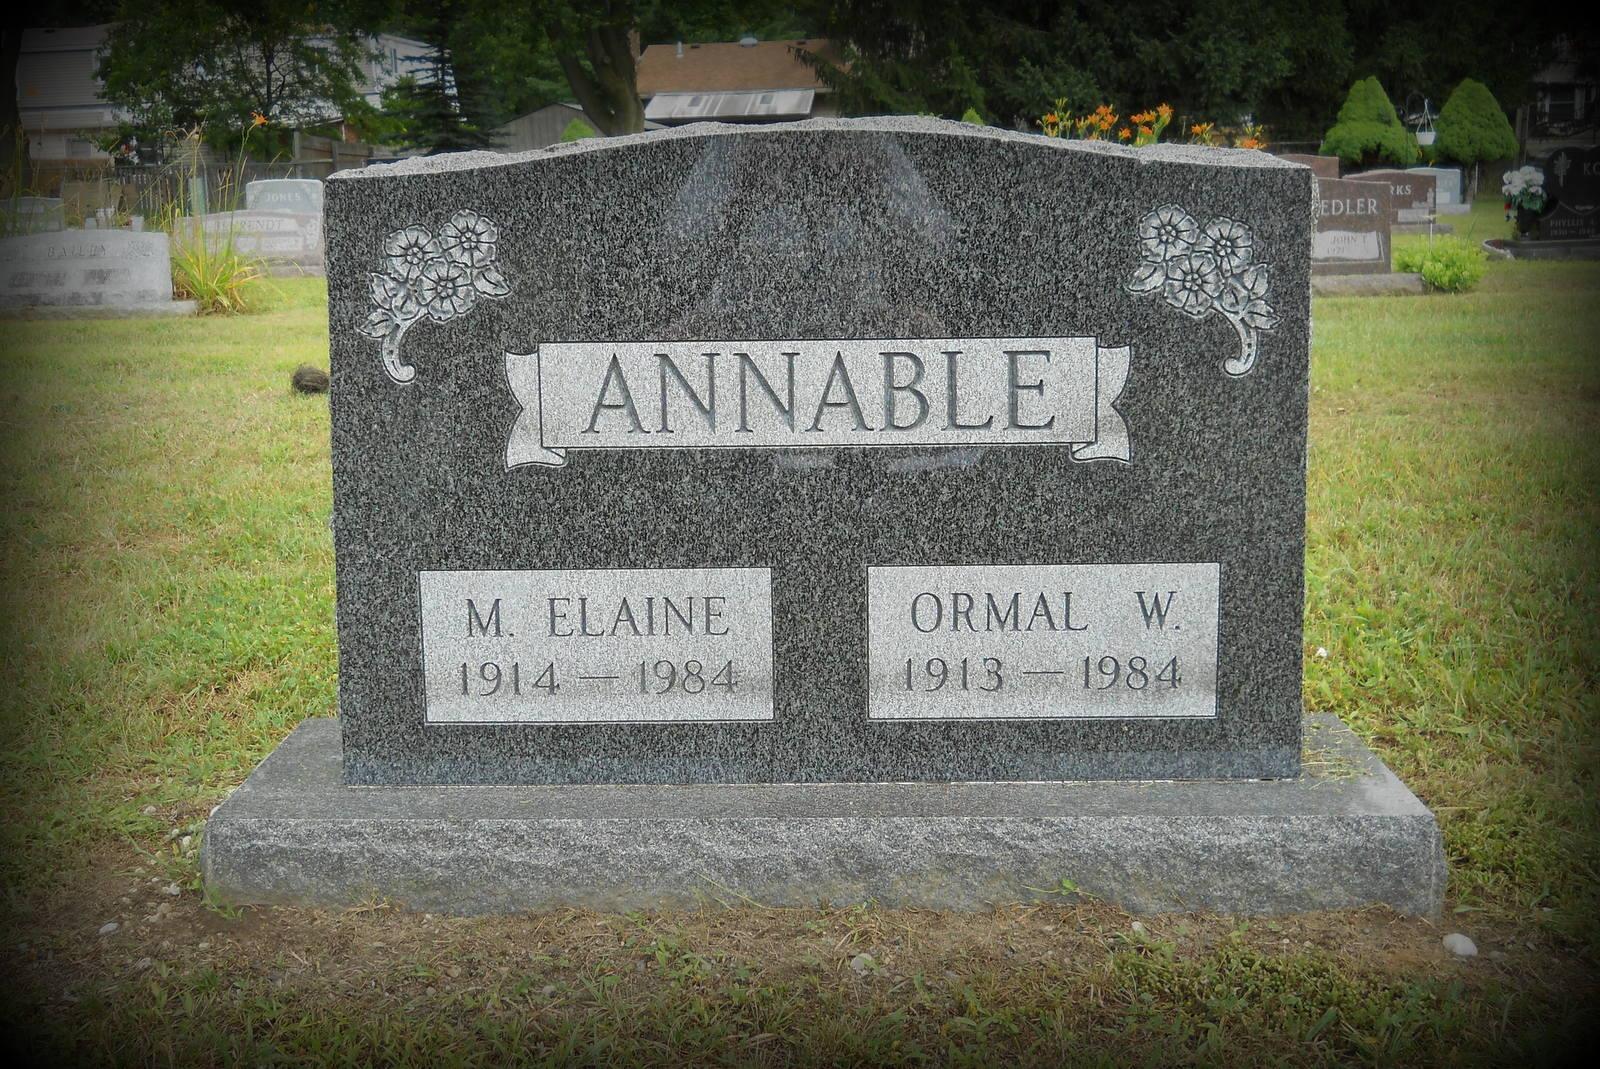 Ormal W. Annable